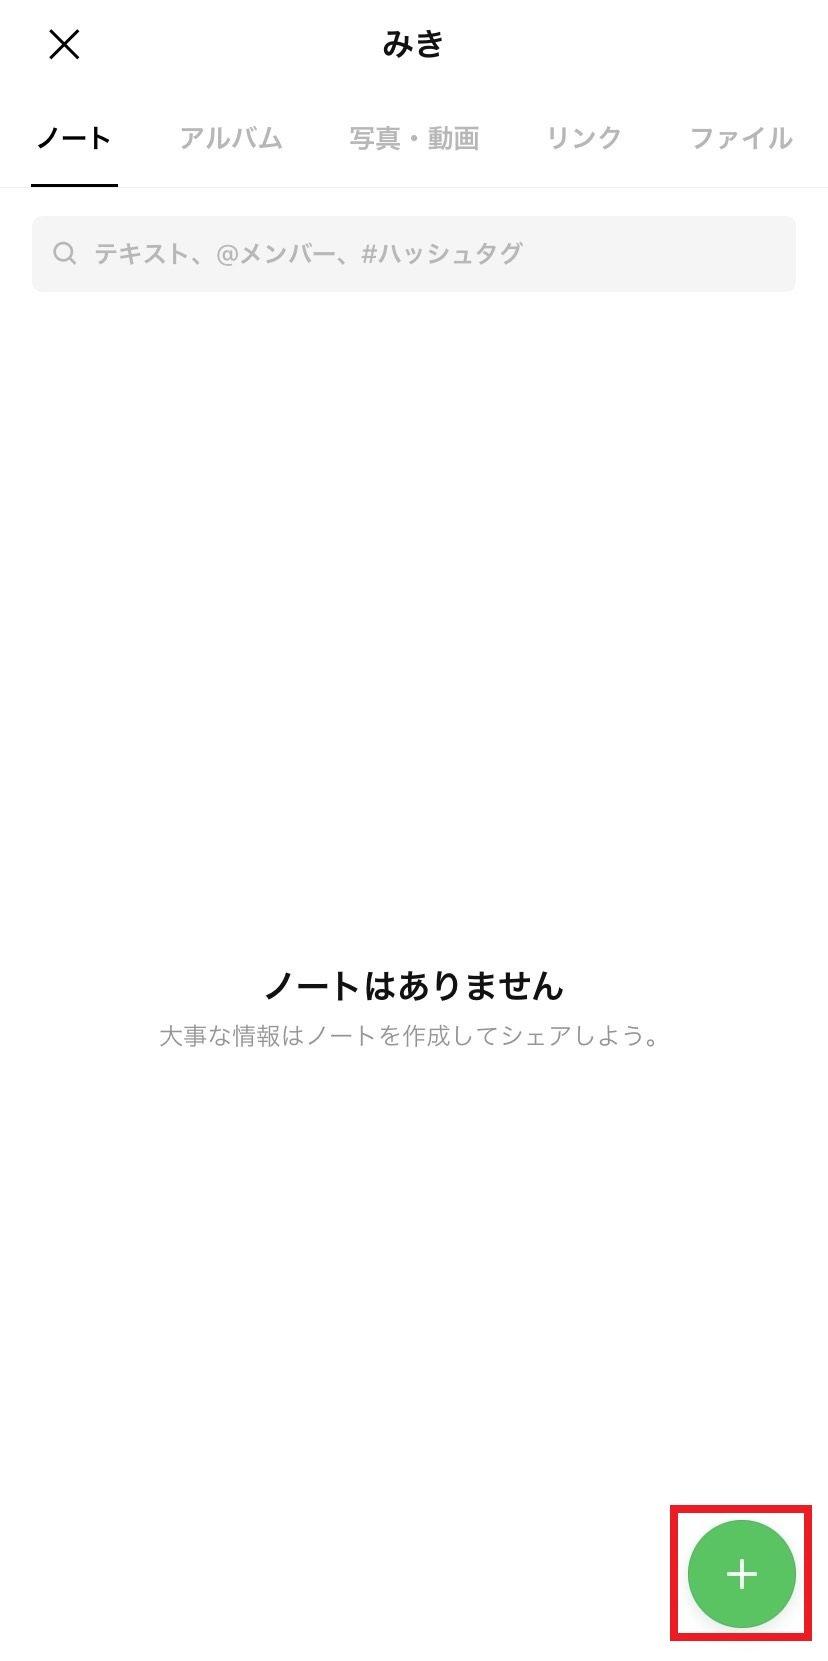 create-notes_03.jpg